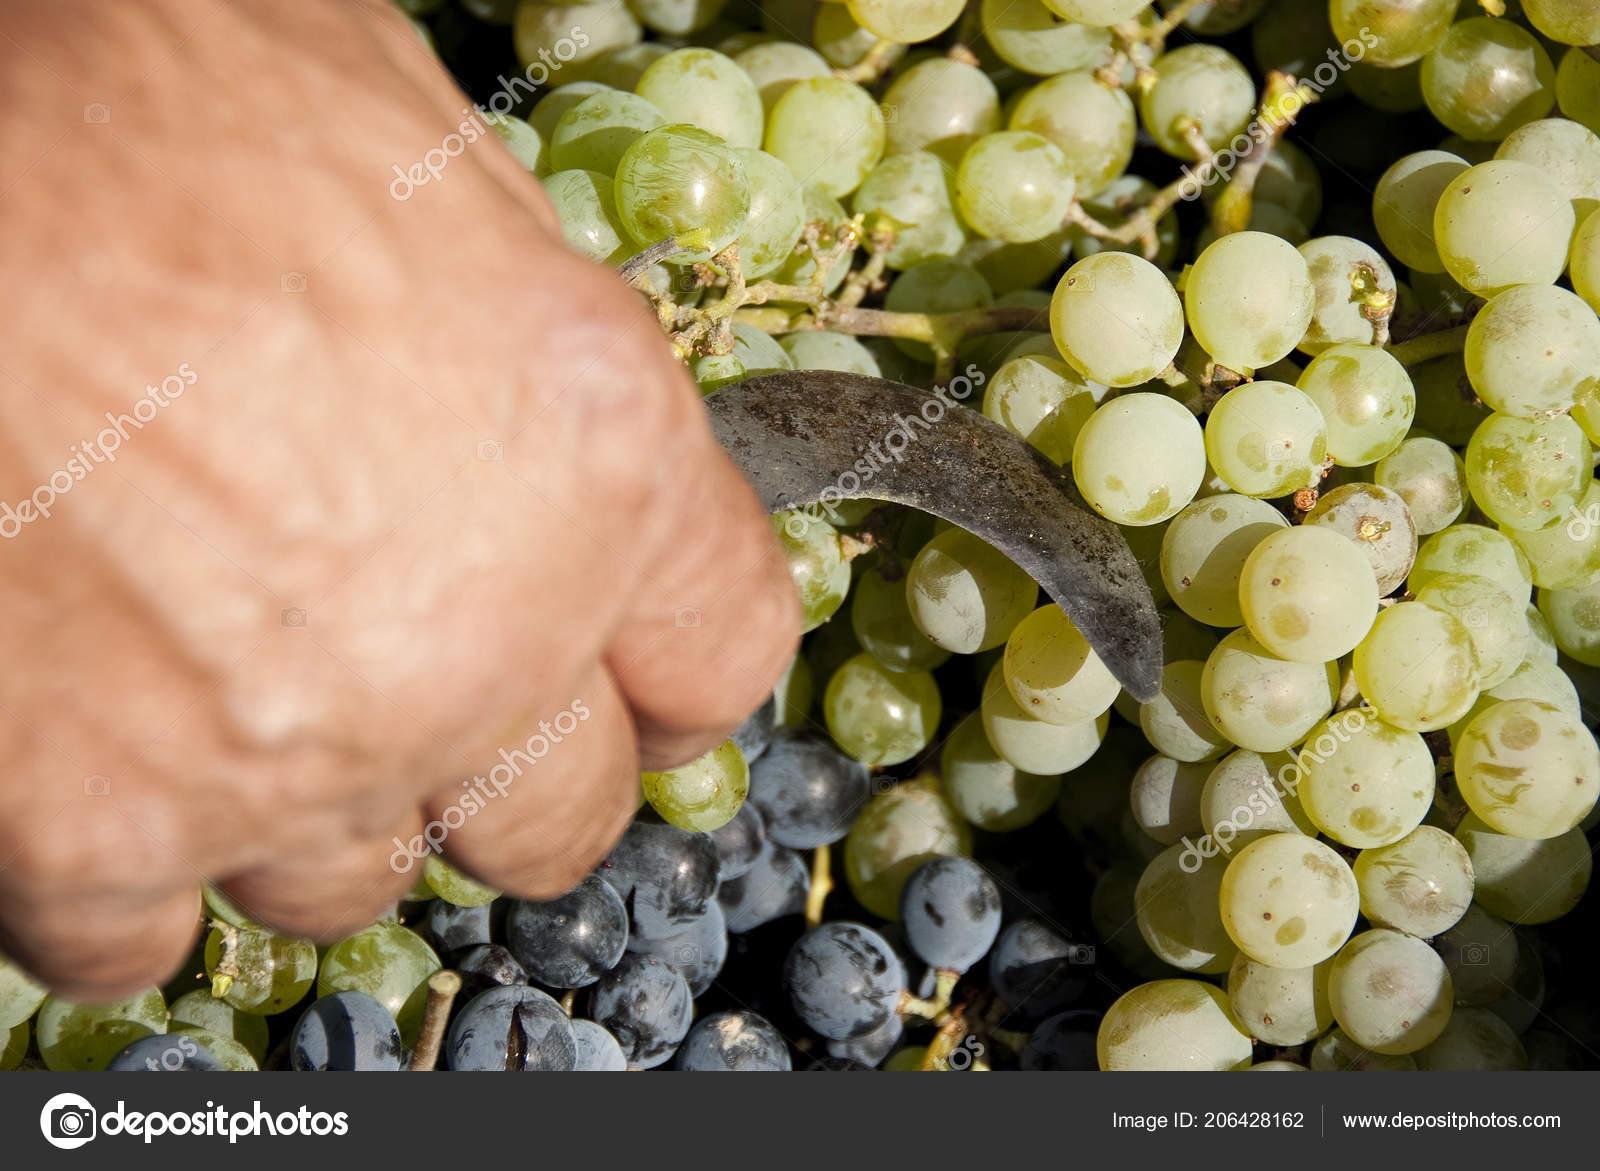 harvesting black grapes bunches grapes white grapes tool harvesting